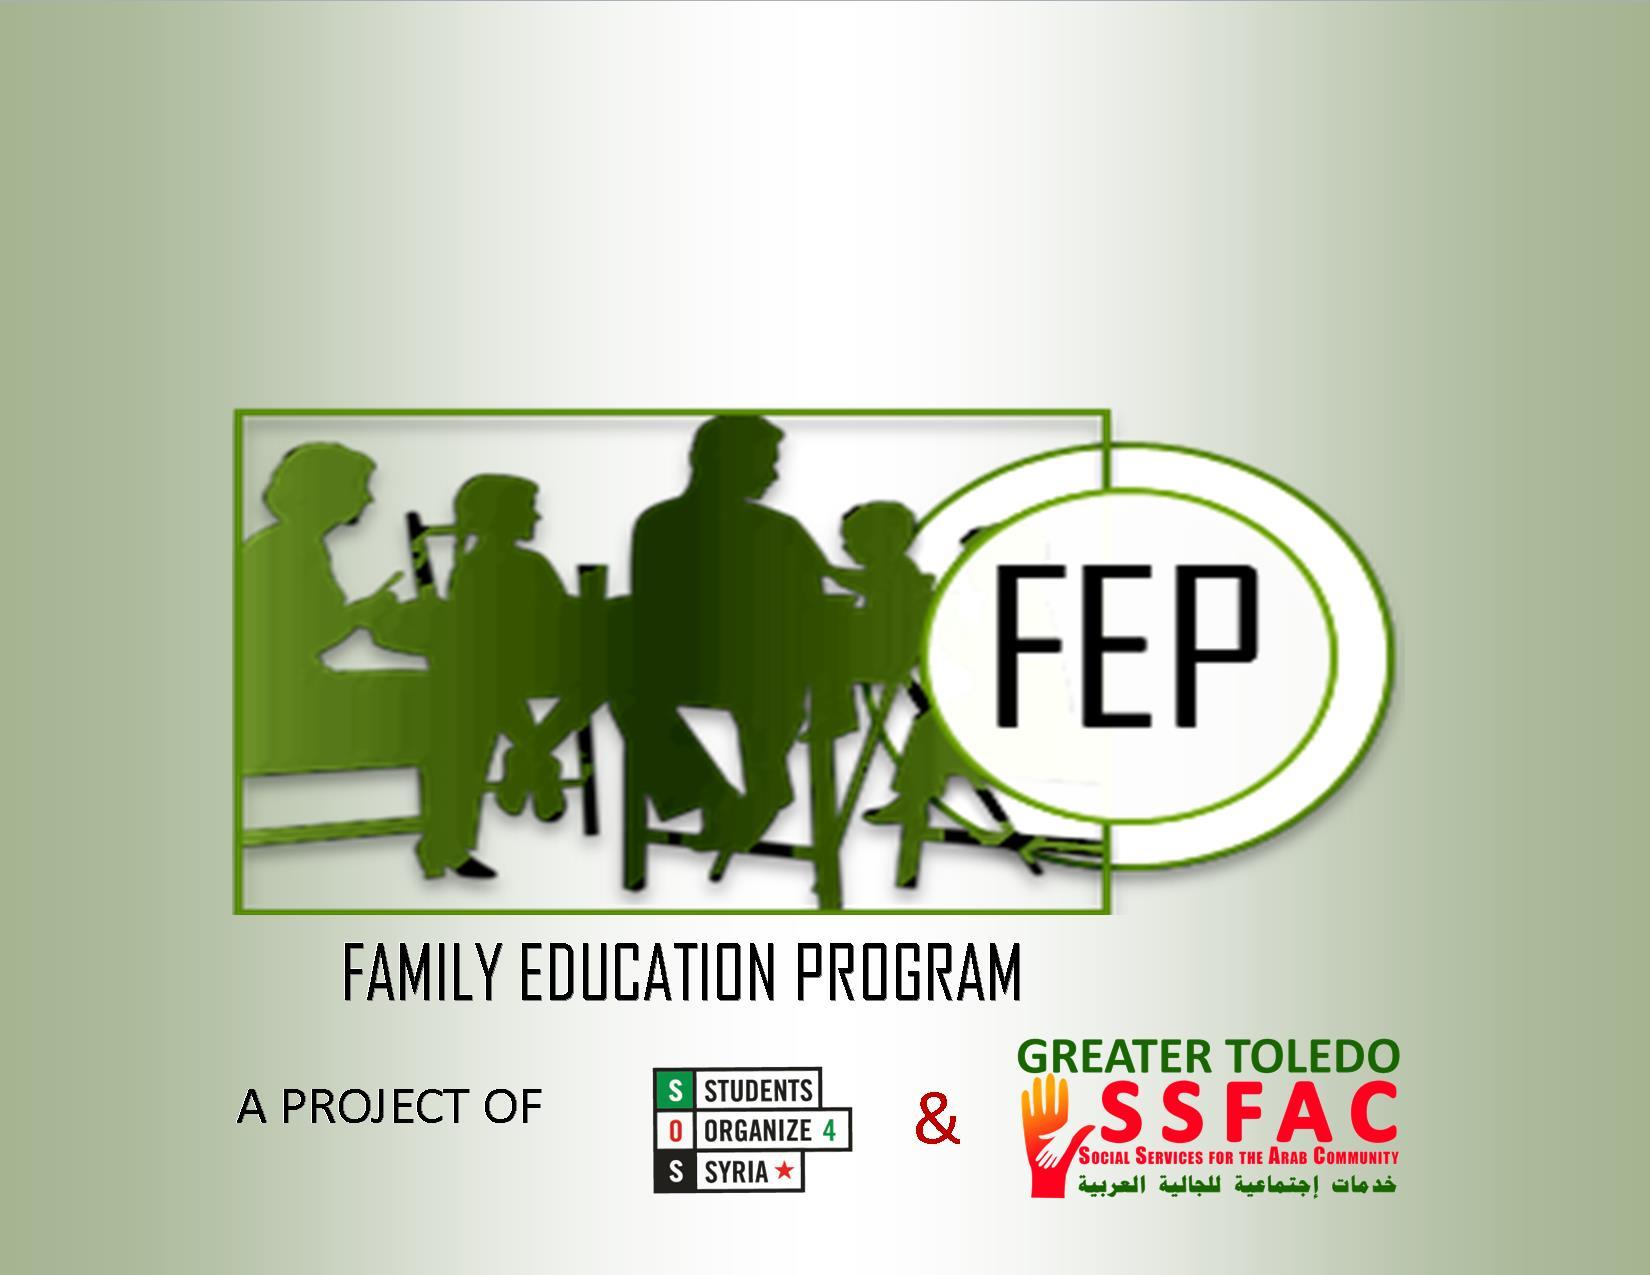 fep logo picture.jpg